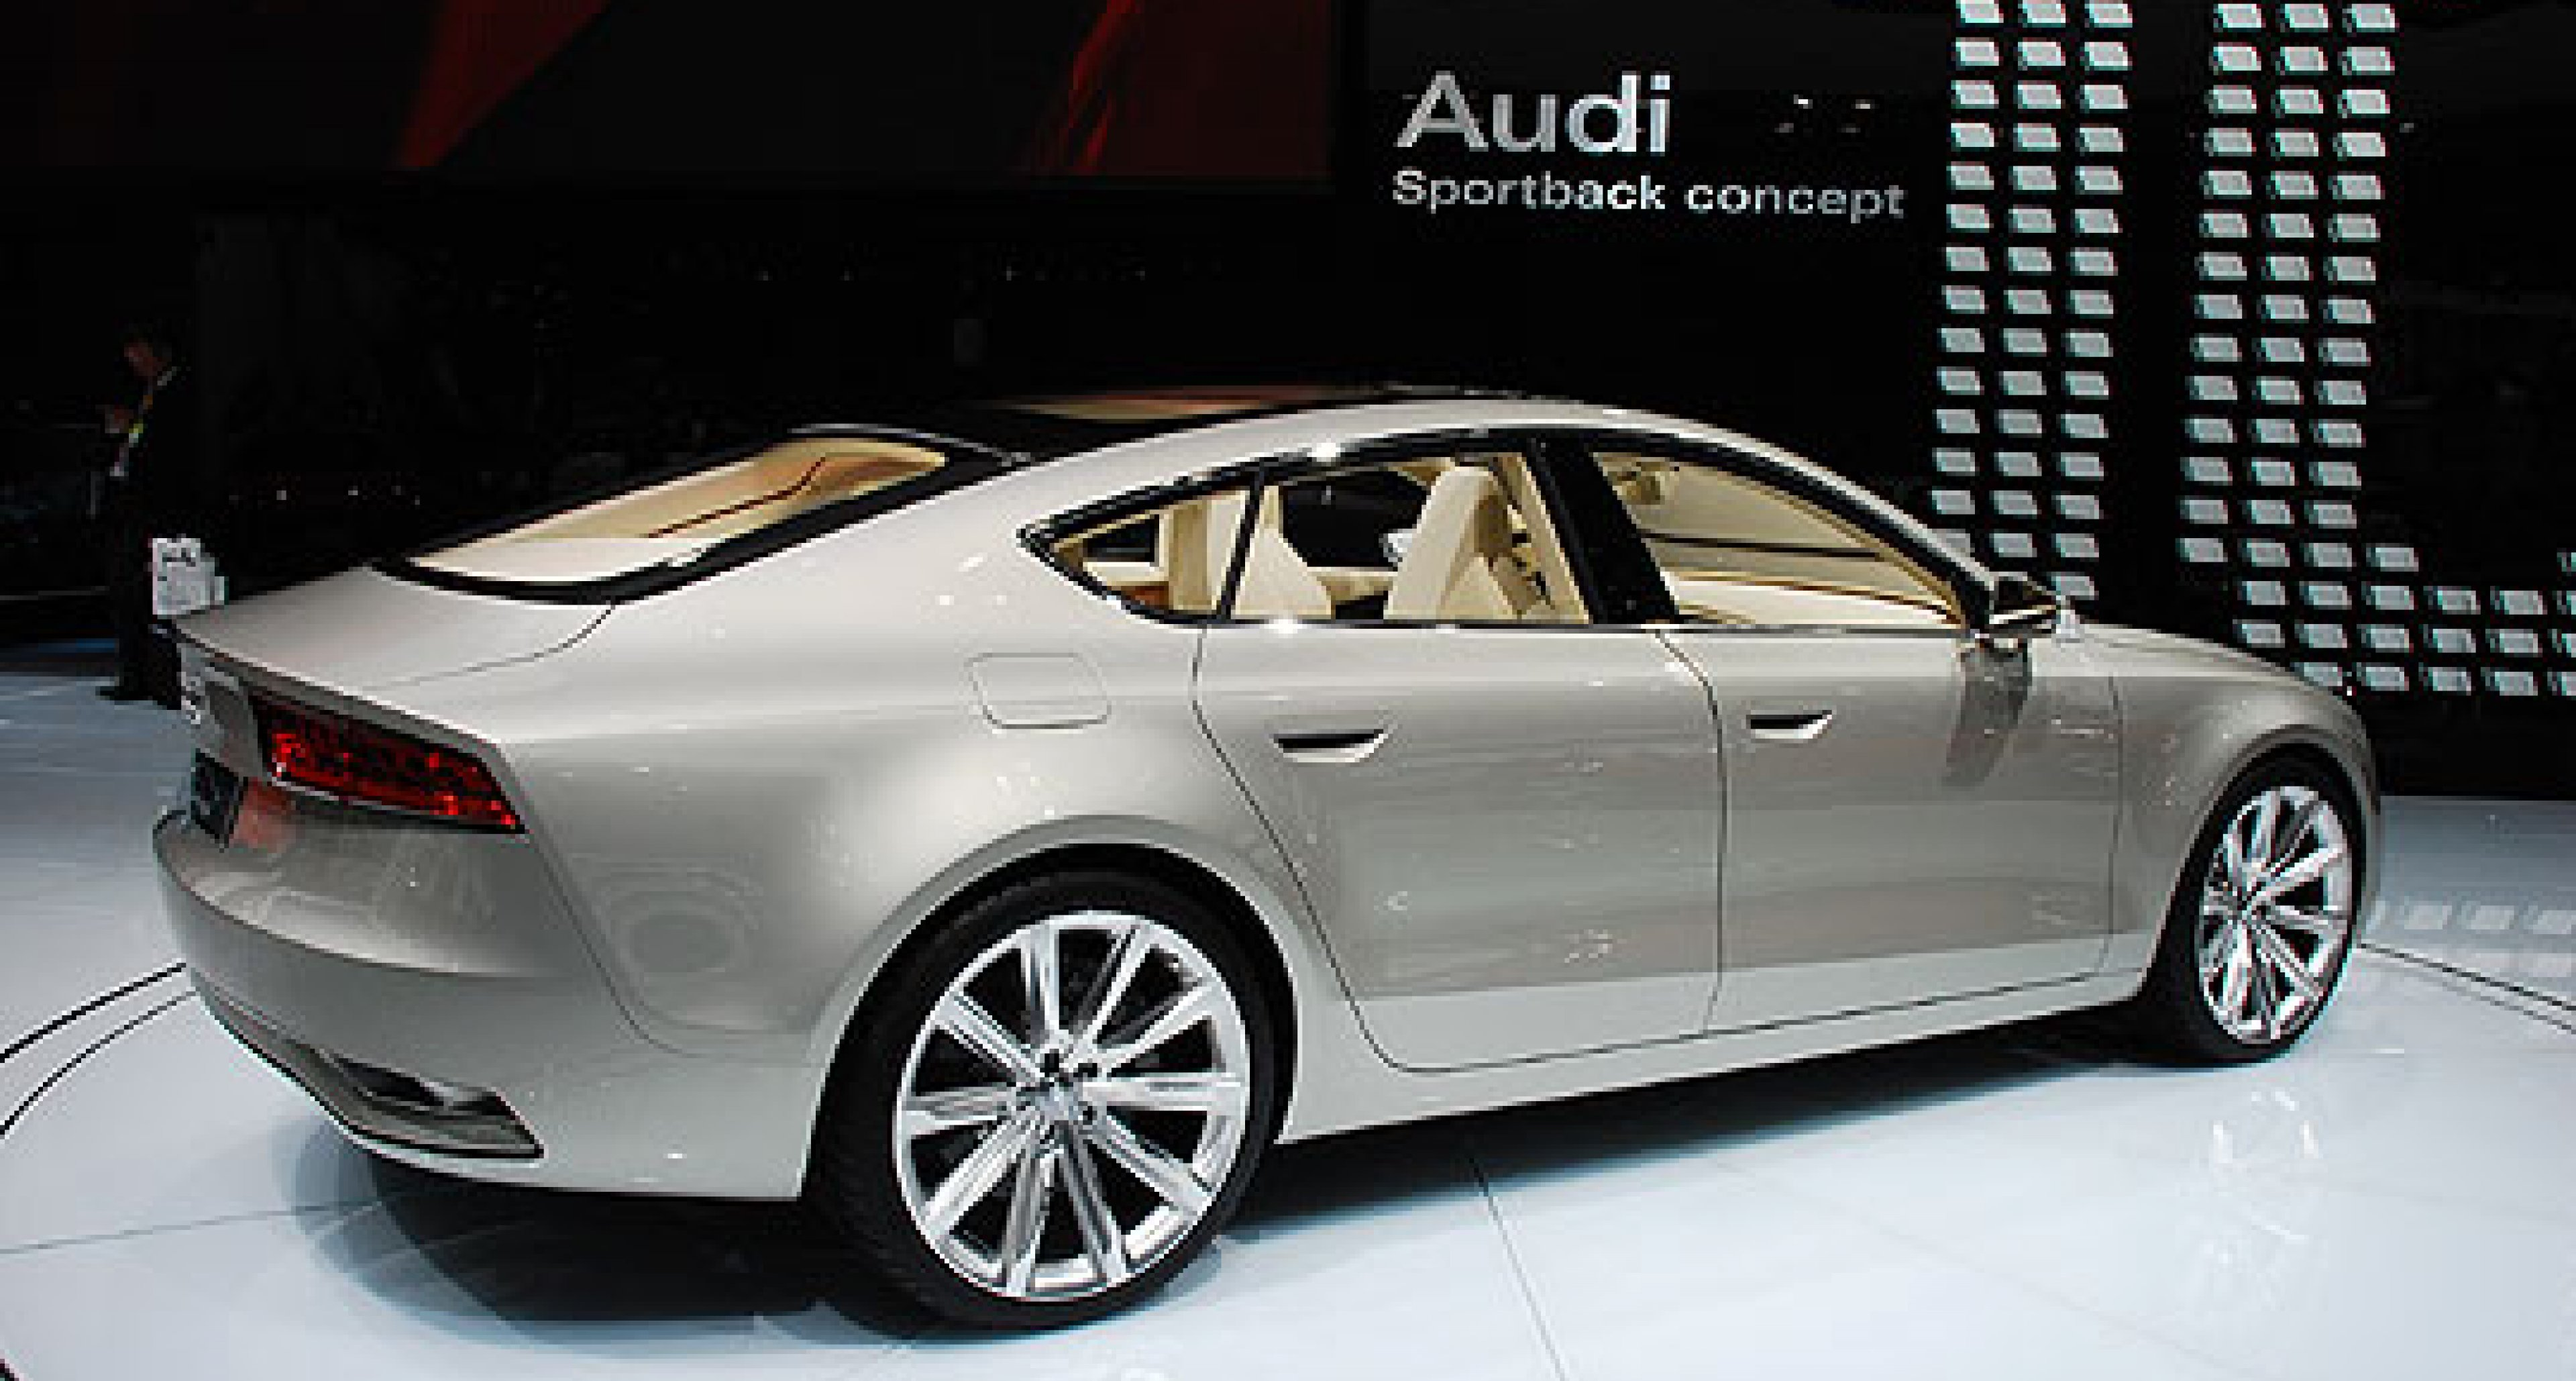 Audi Sportback Concept Impresses in Detroit